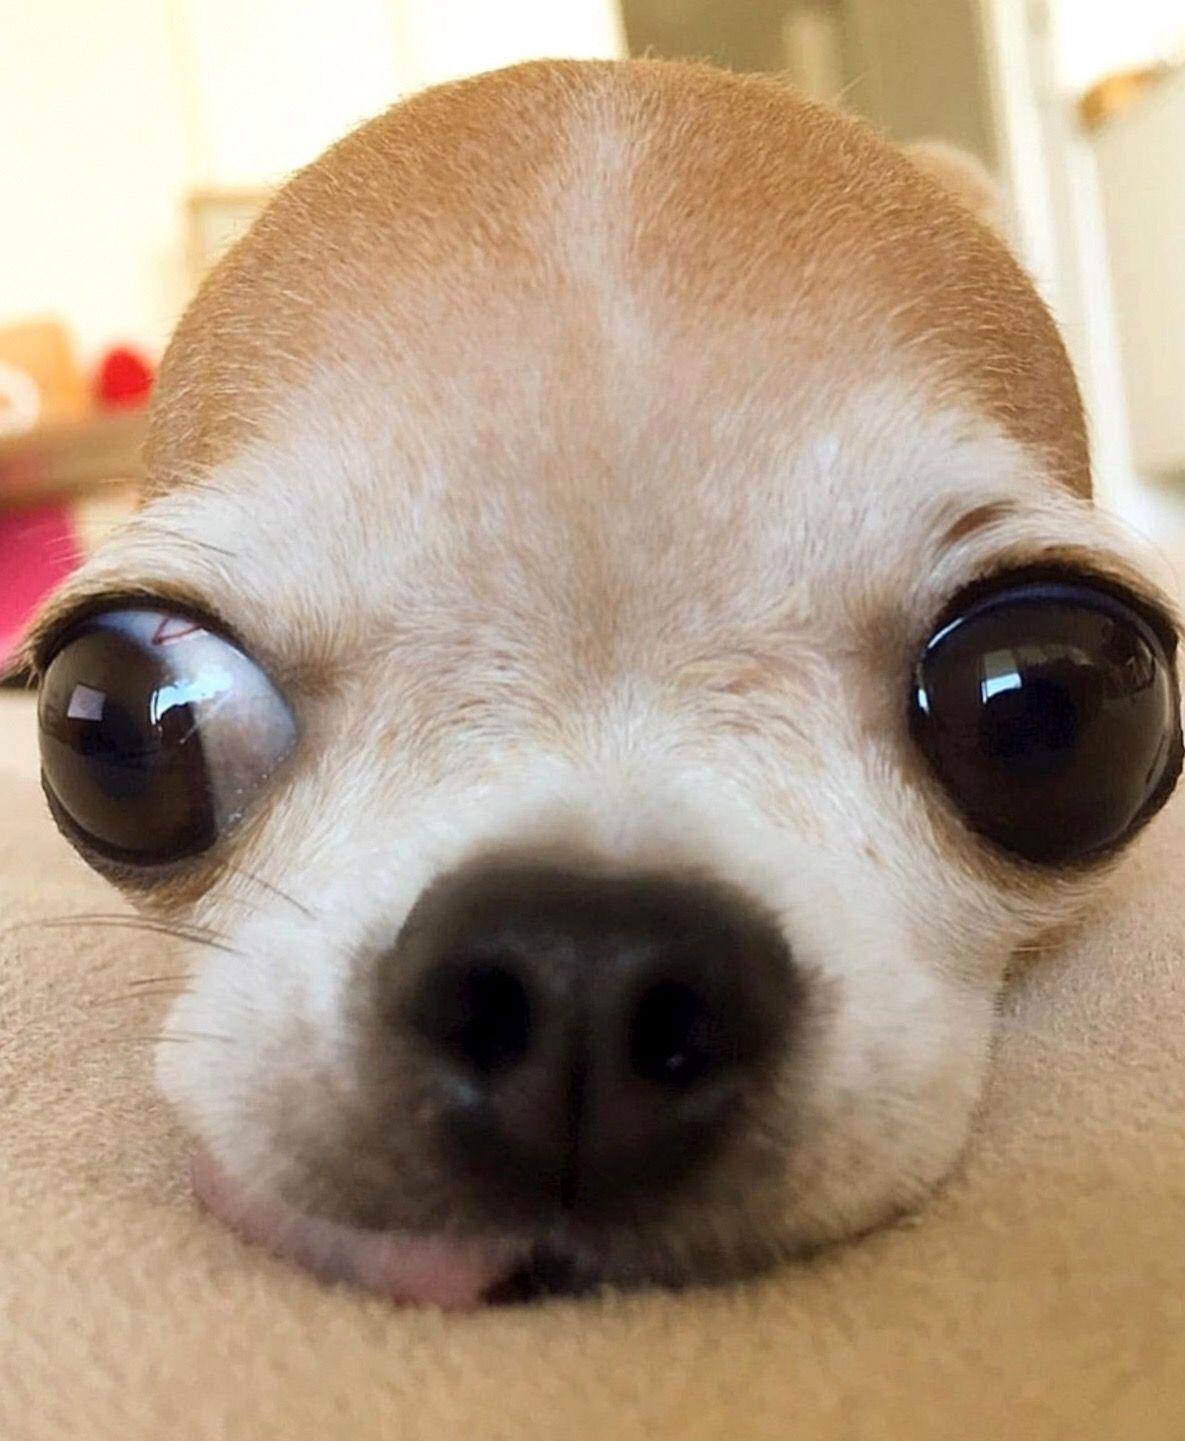 Chihuahua Chihuahua Dogs Chihuahua Chihuahua Puppies